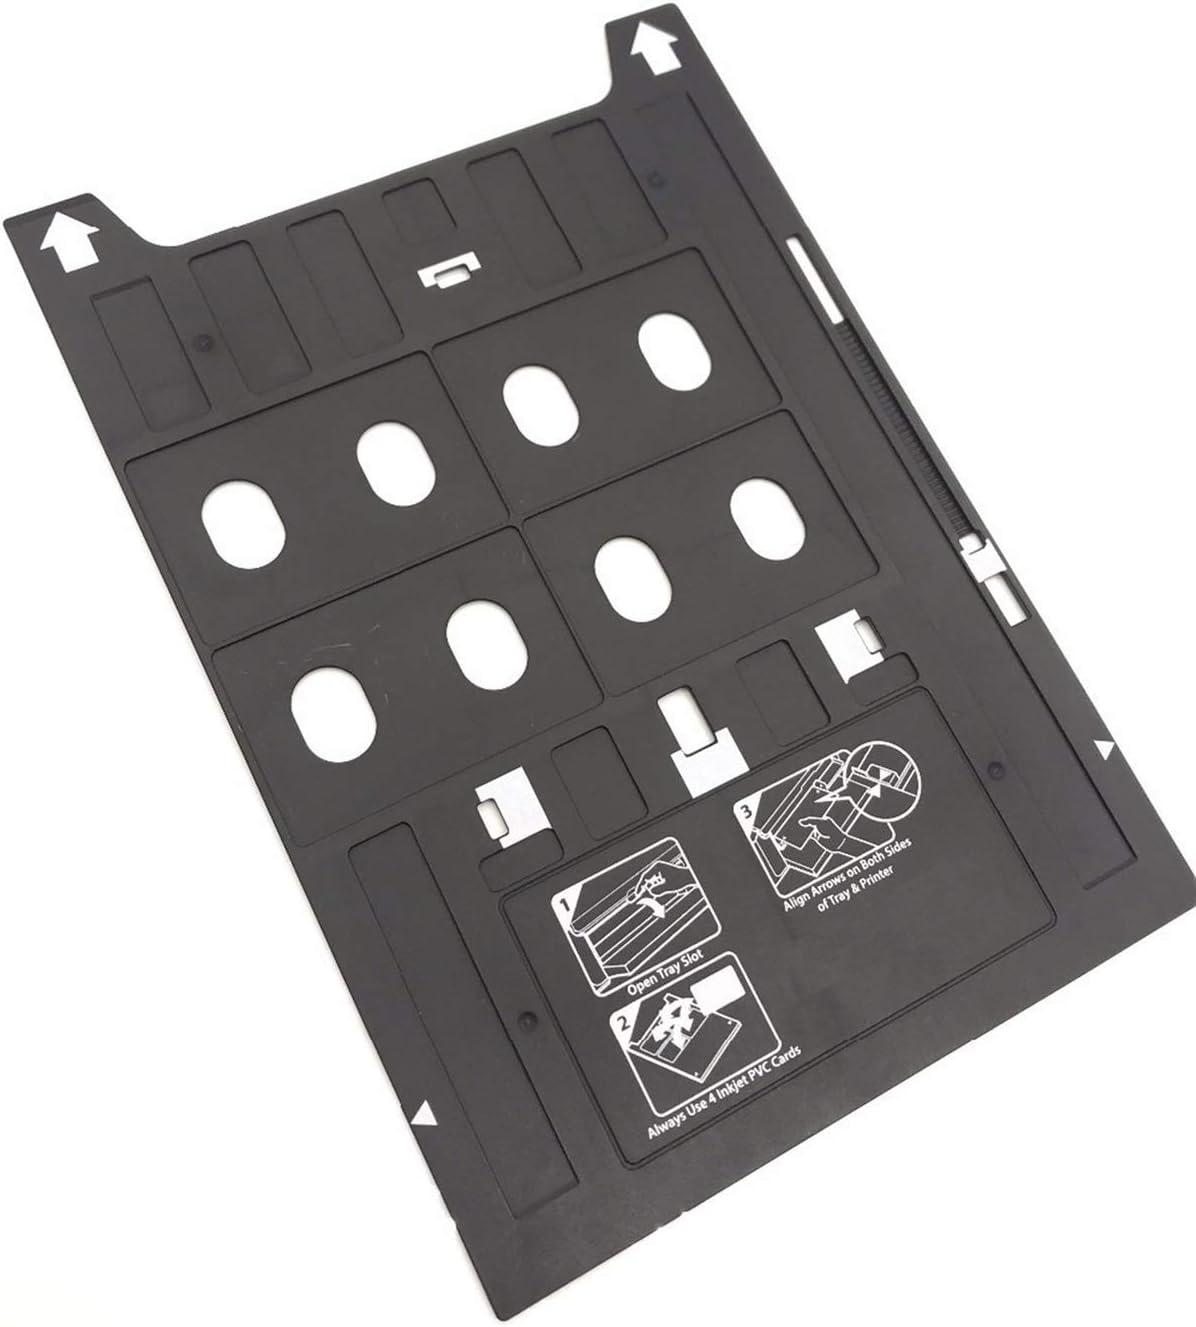 New Printer Accessories 1PC X Plastic Inkjet PVC ID Card Printing Tray Compatible with Epson 1400 1410 1430 1430W 1500W R800 R1800 R1900 R2000 R2880 R3000 P400 P600